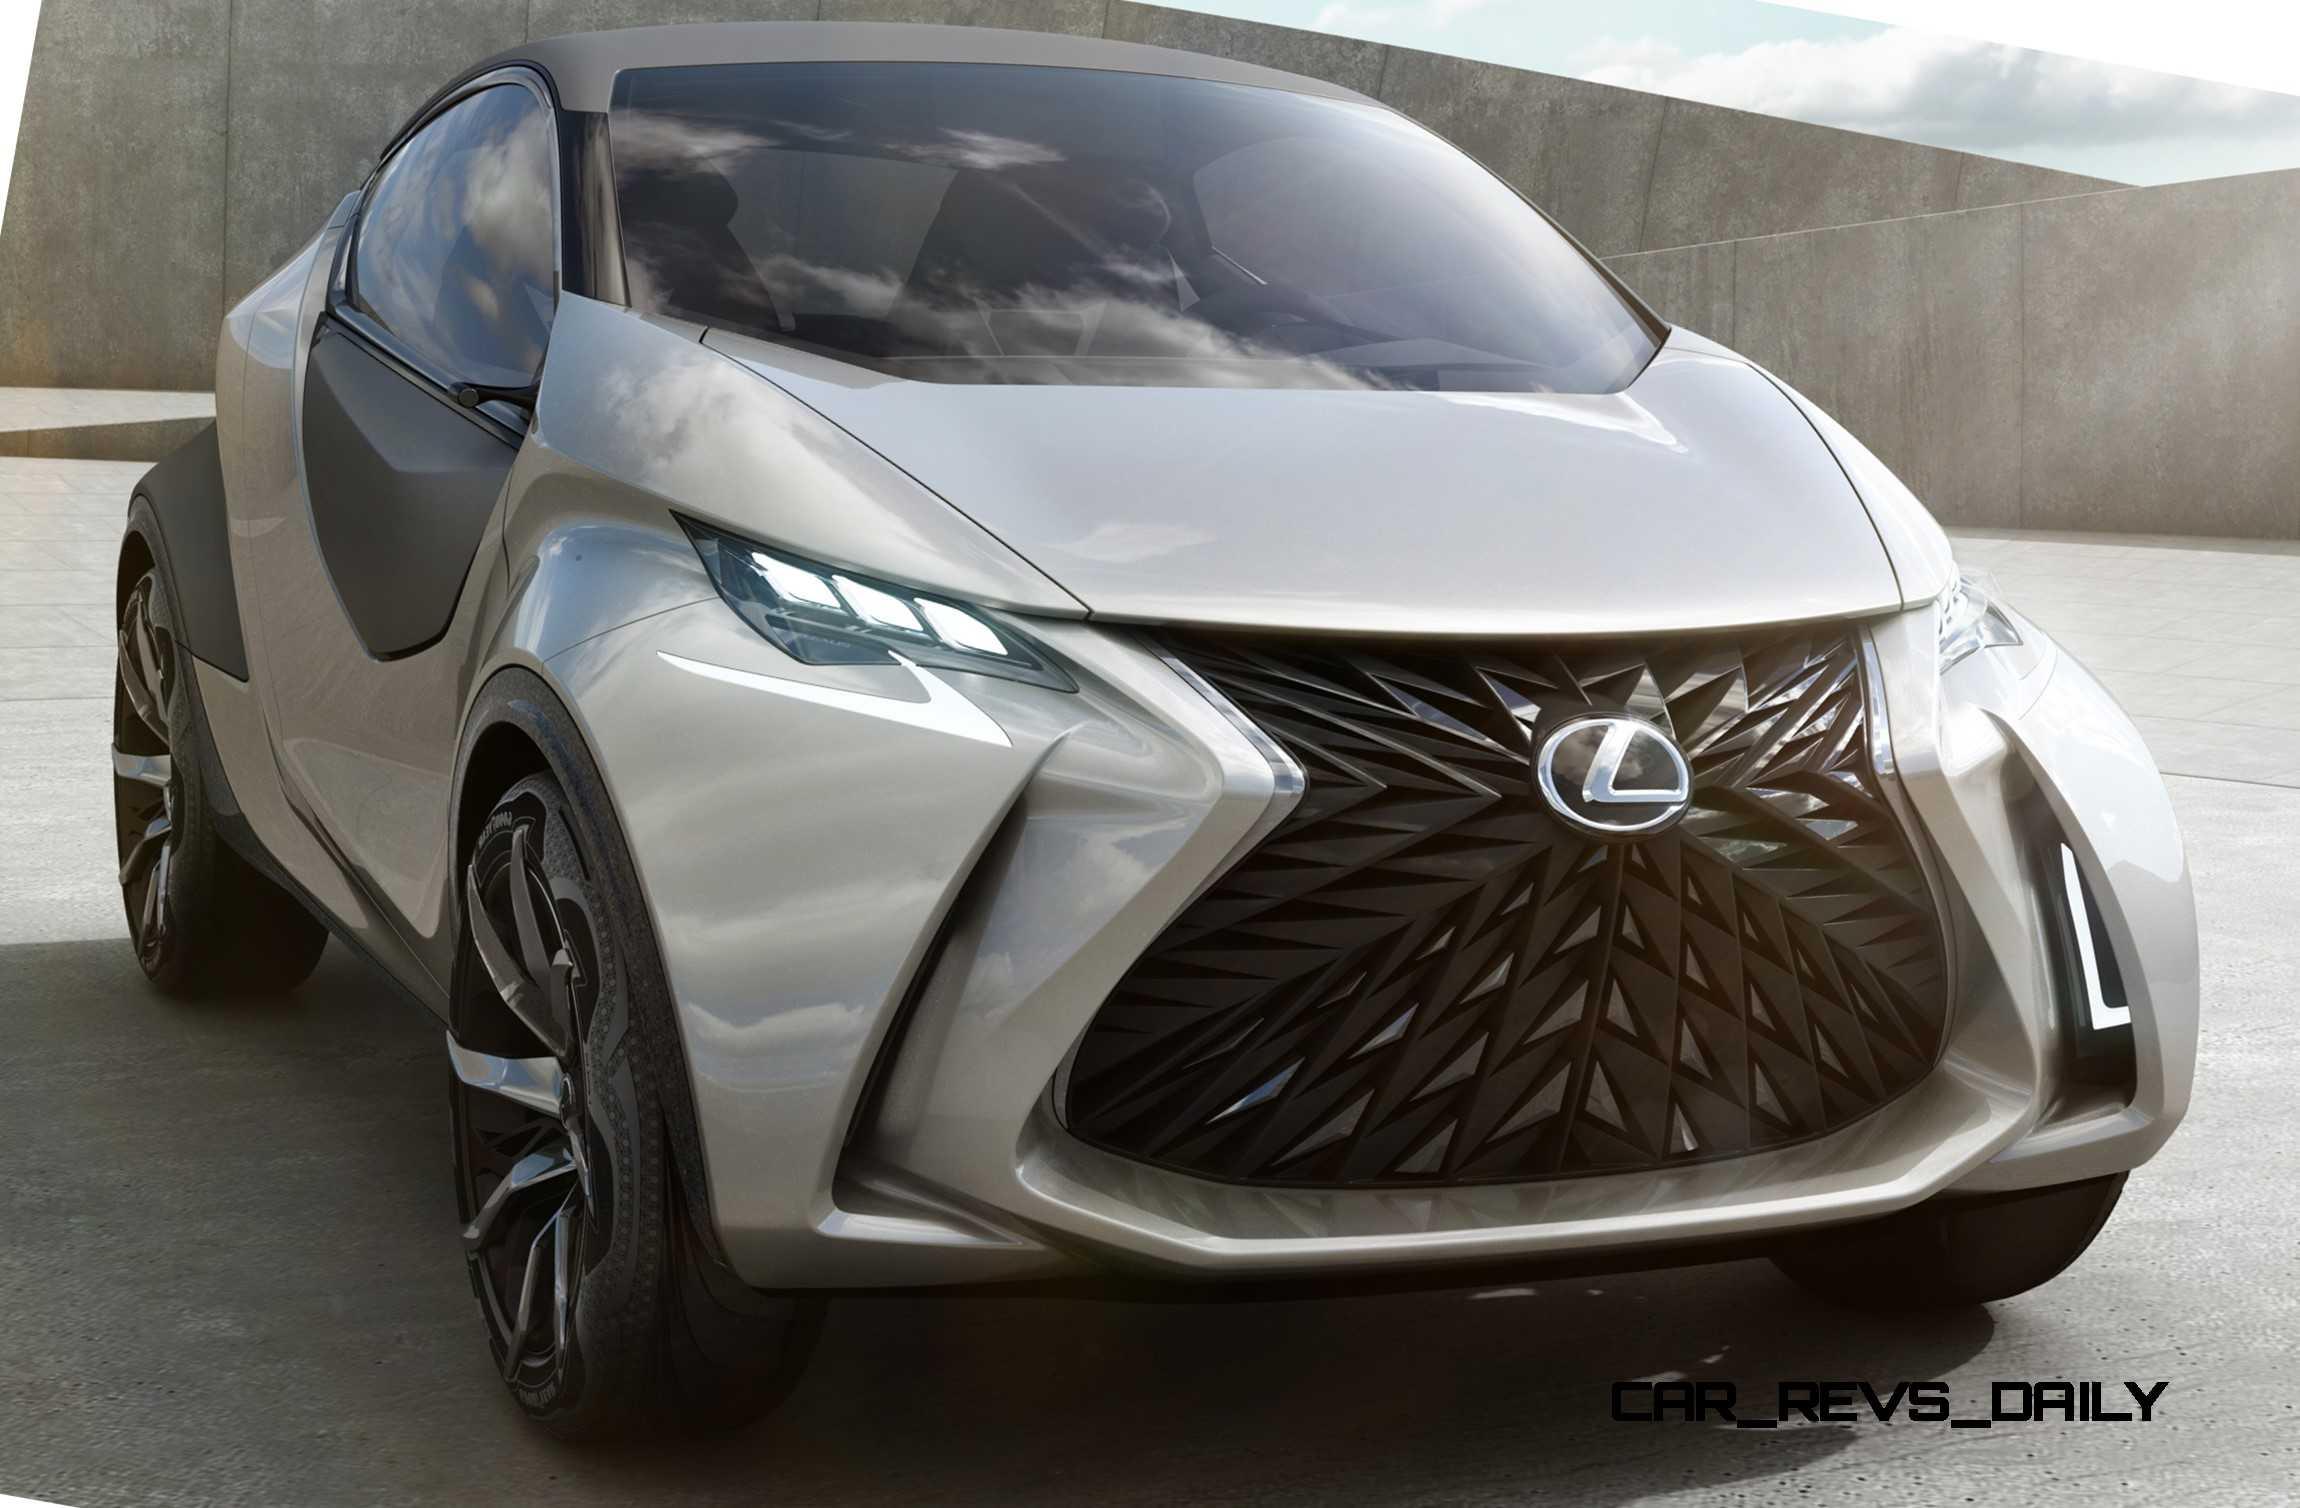 http://www.car-revs-daily.com/wp-content/uploads/2015/03/2015-Lexus-LF-SA-Concept-16.jpg